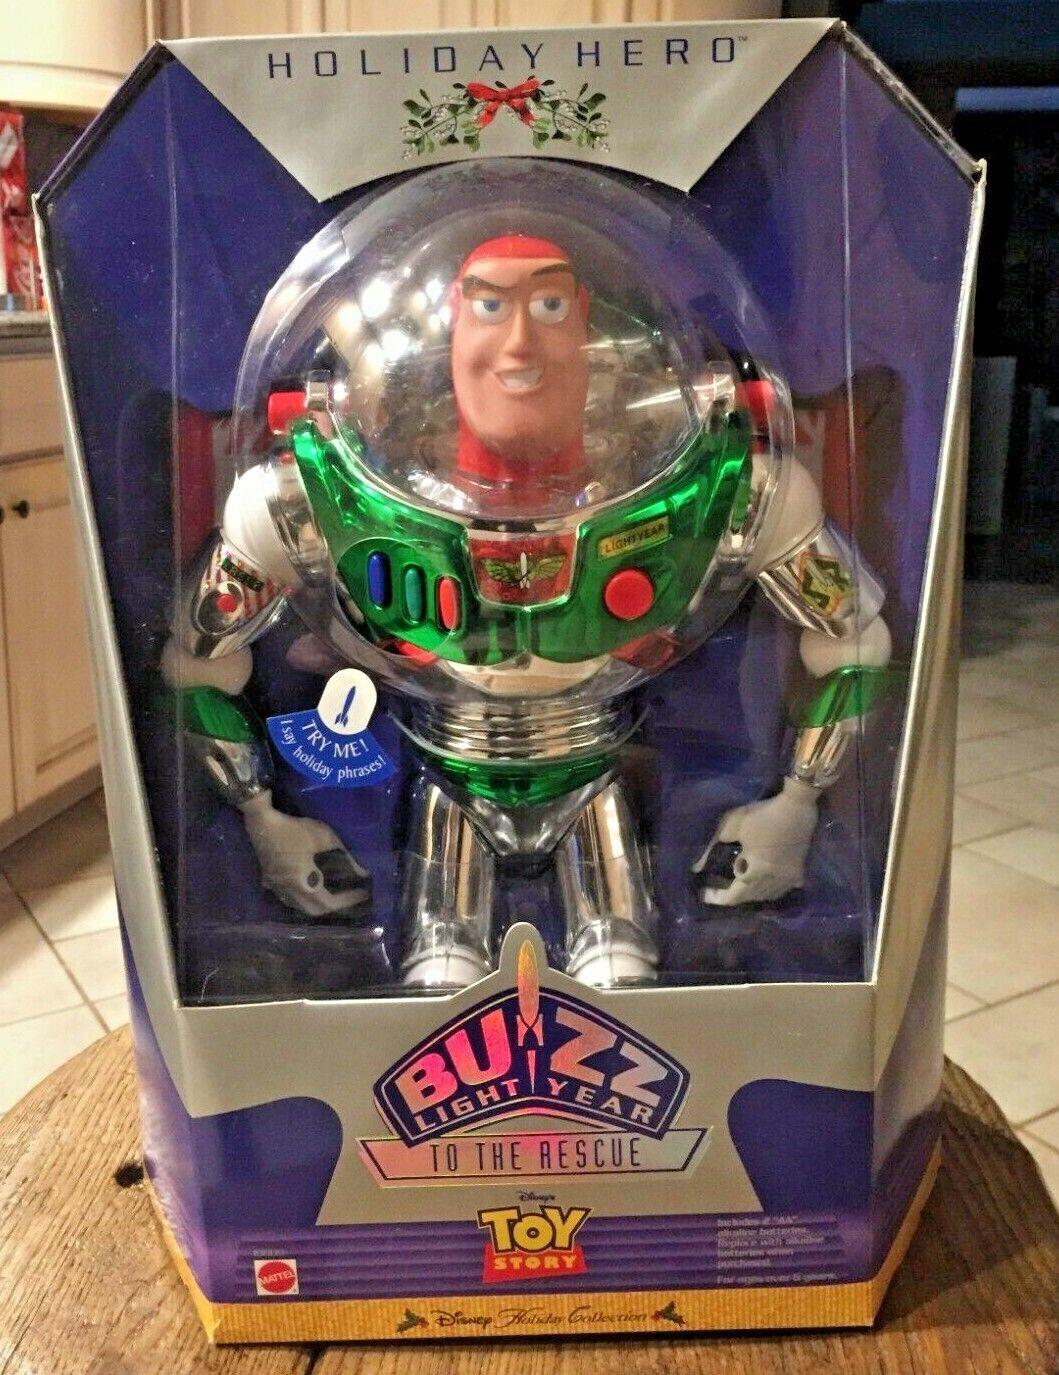 Toy Story Holiday Hero Buzz Lightyear